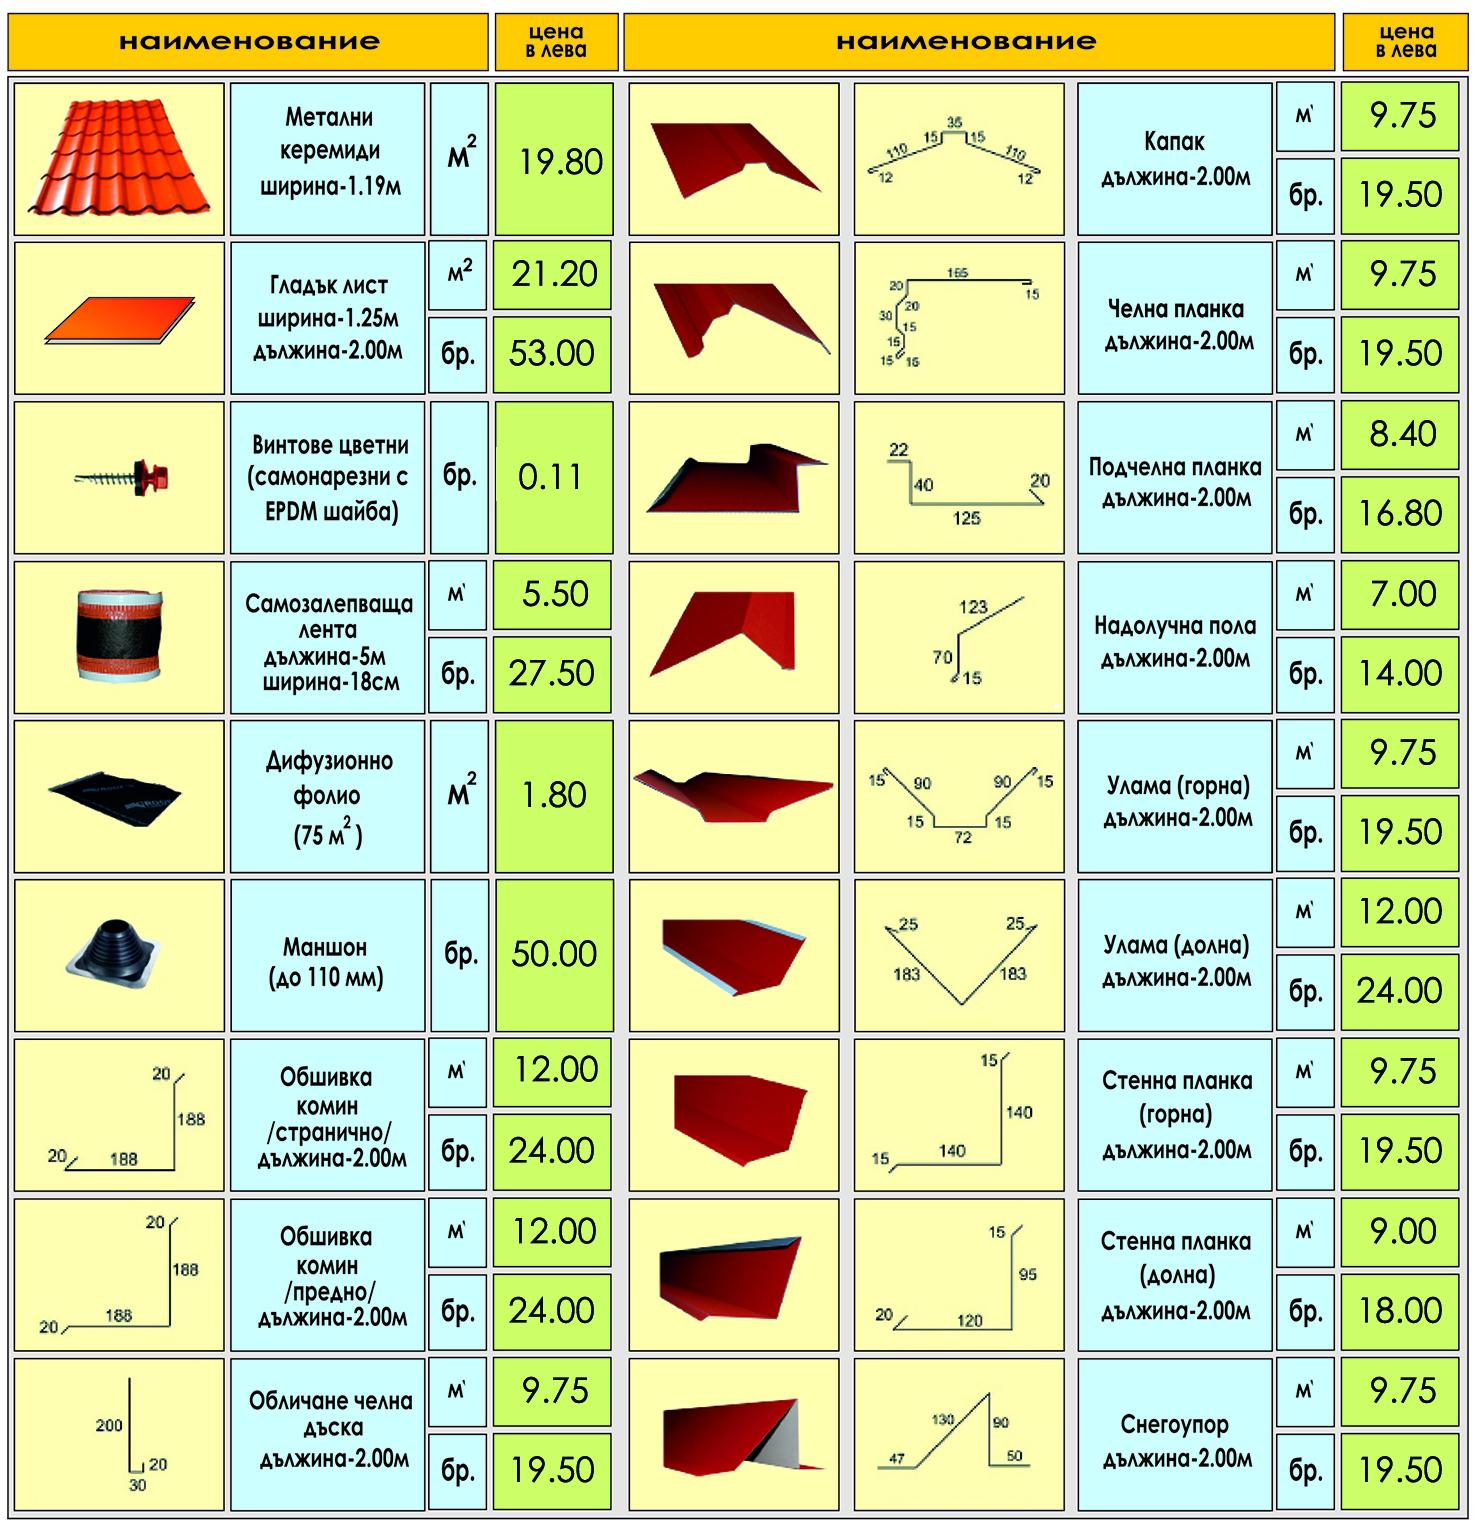 Метални керемиди Модел Roof Цени - гланц